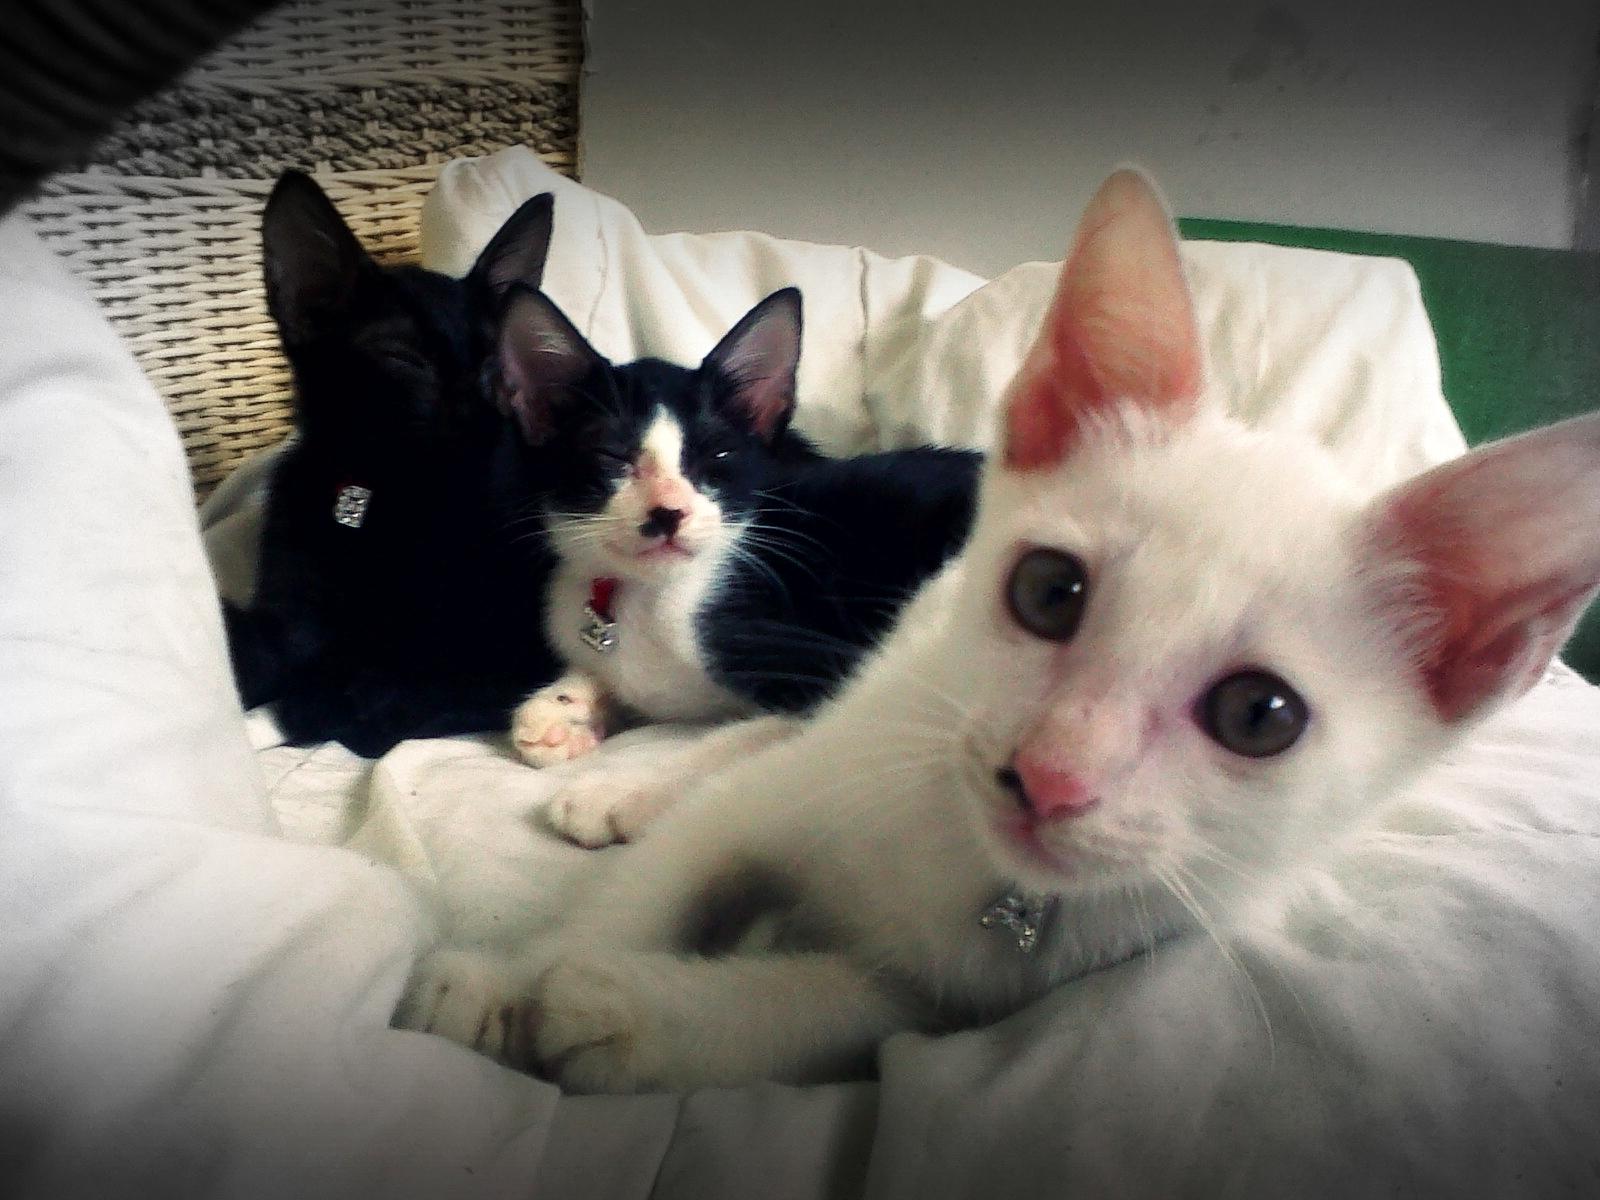 Perawatan Kucing Merawat Kucing Sedang Sakit